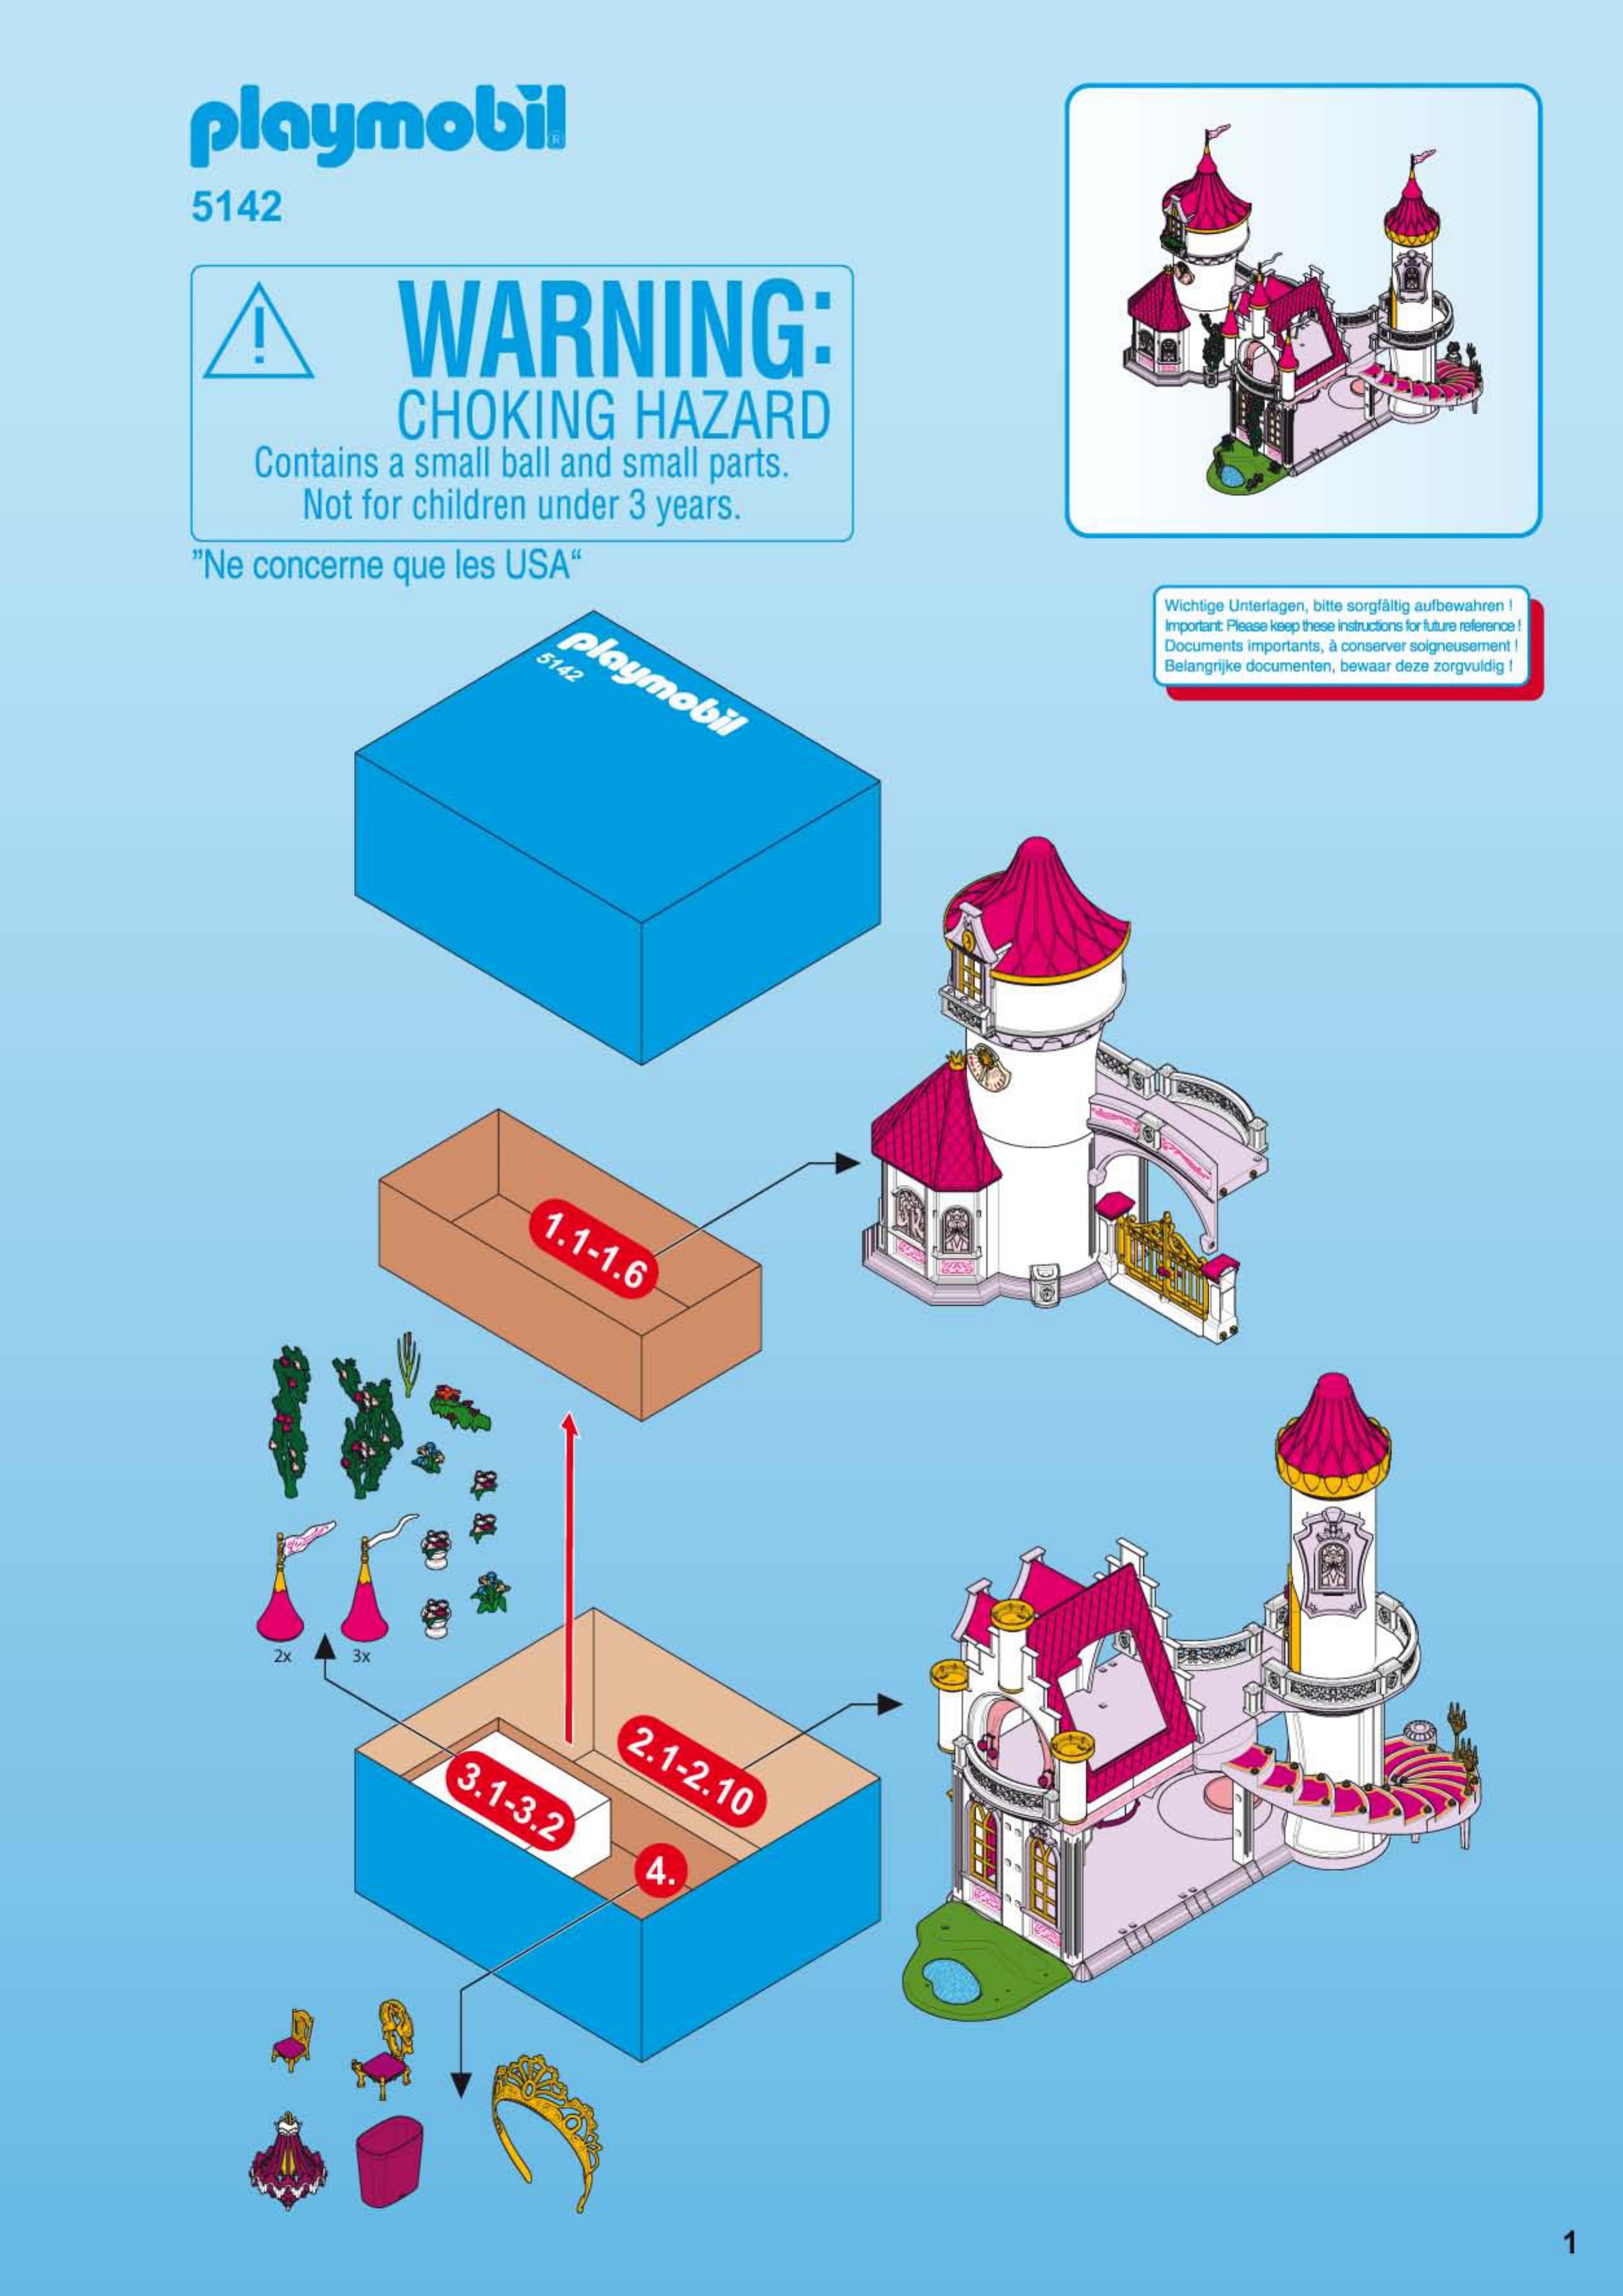 Handleiding playmobil 5142 pagina 1 van 28 dansk for Notice de montage chateau princesse playmobil